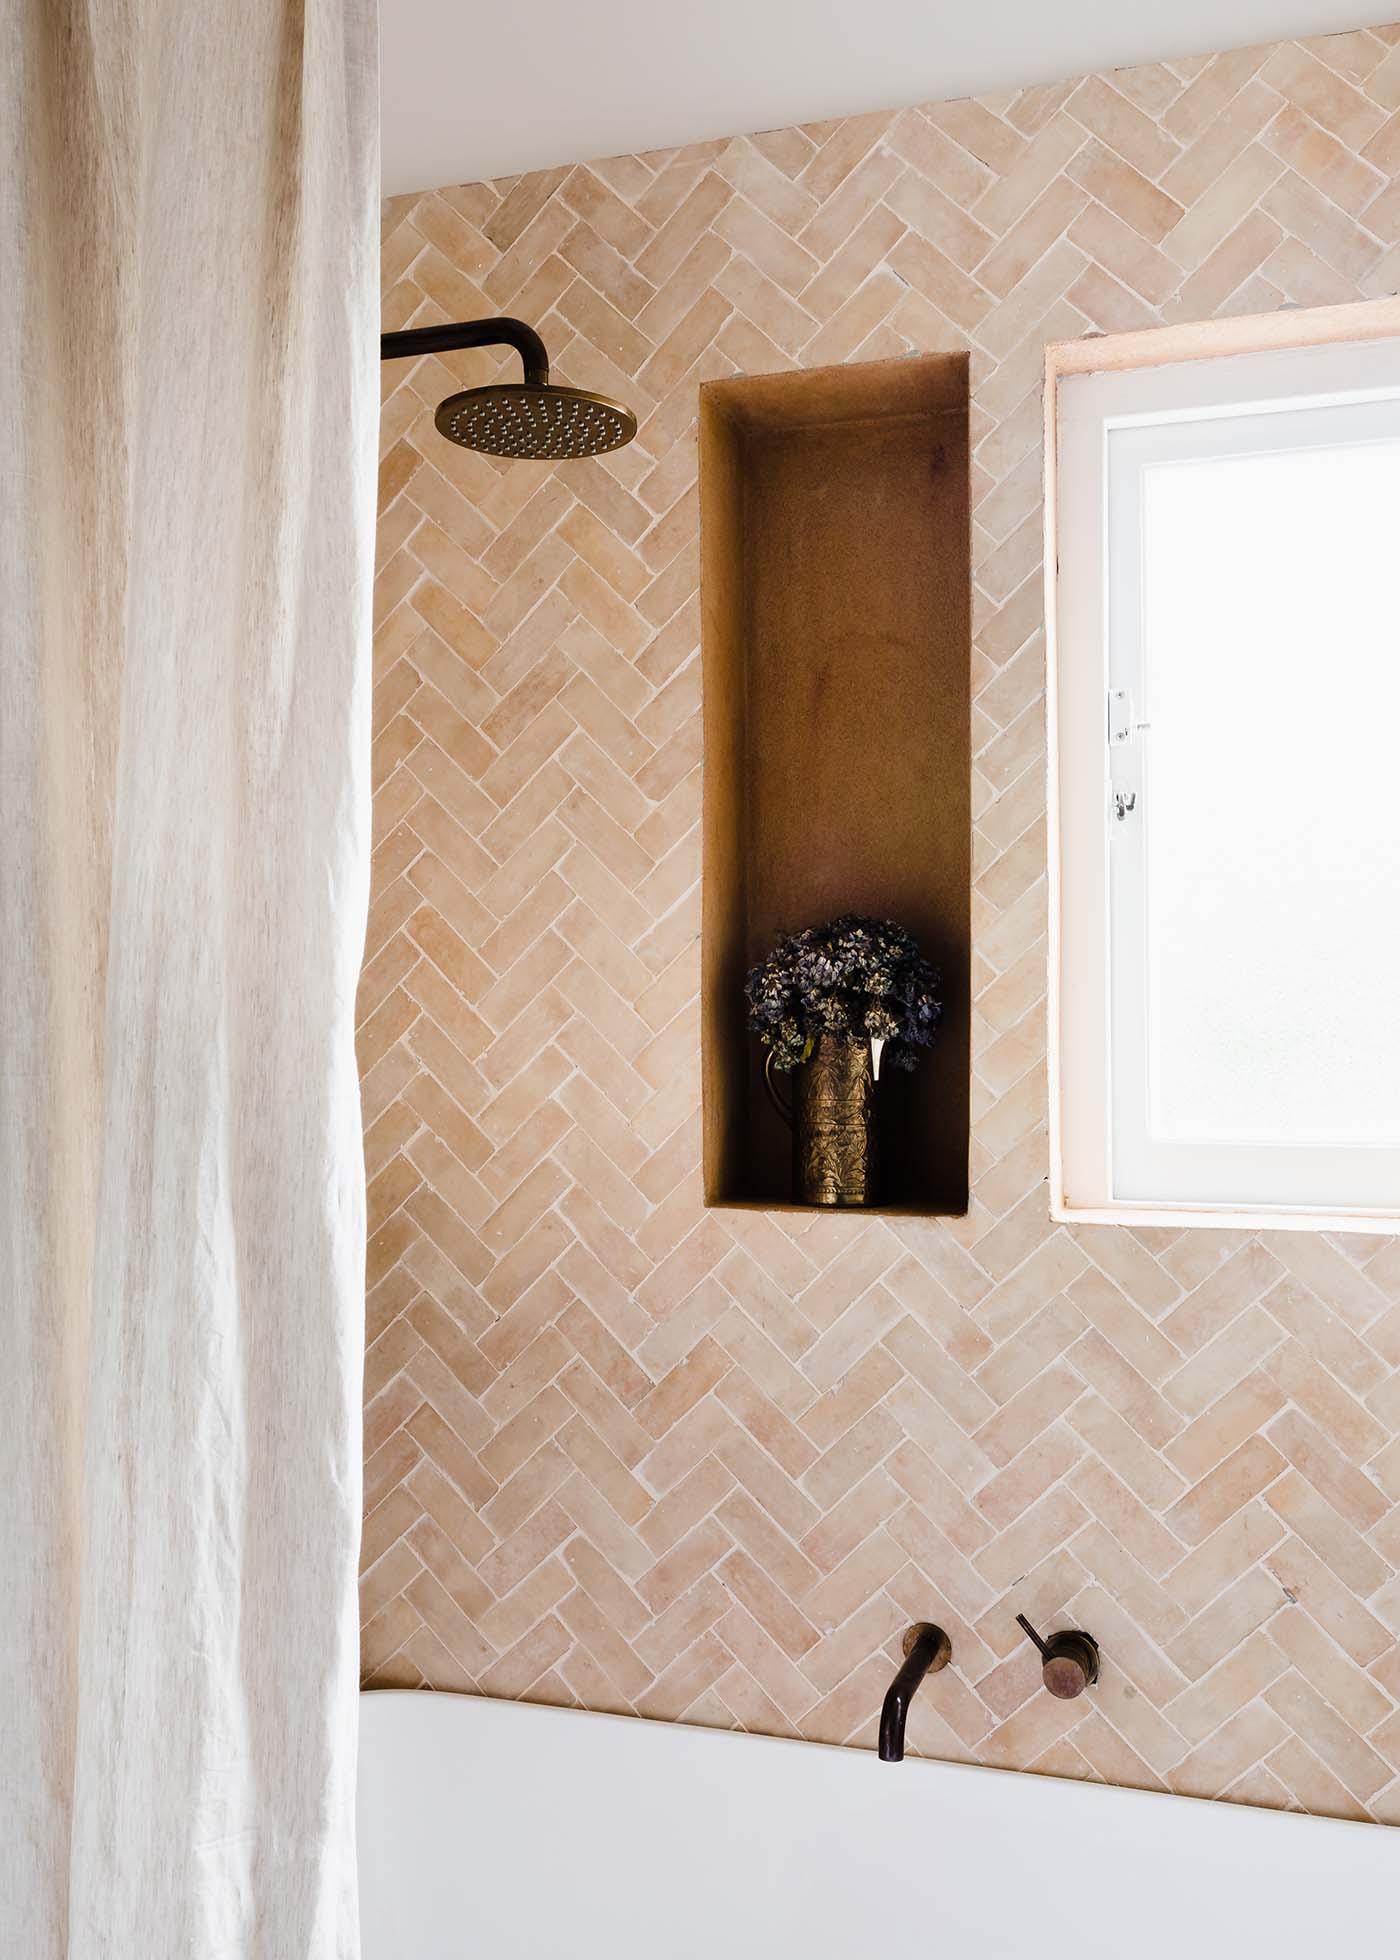 GABBE INTERIOR TILESOFEZRA Georgia Ezra Home Feature shower Mosaic Moroccan Bejmat feature wall tile.jpg